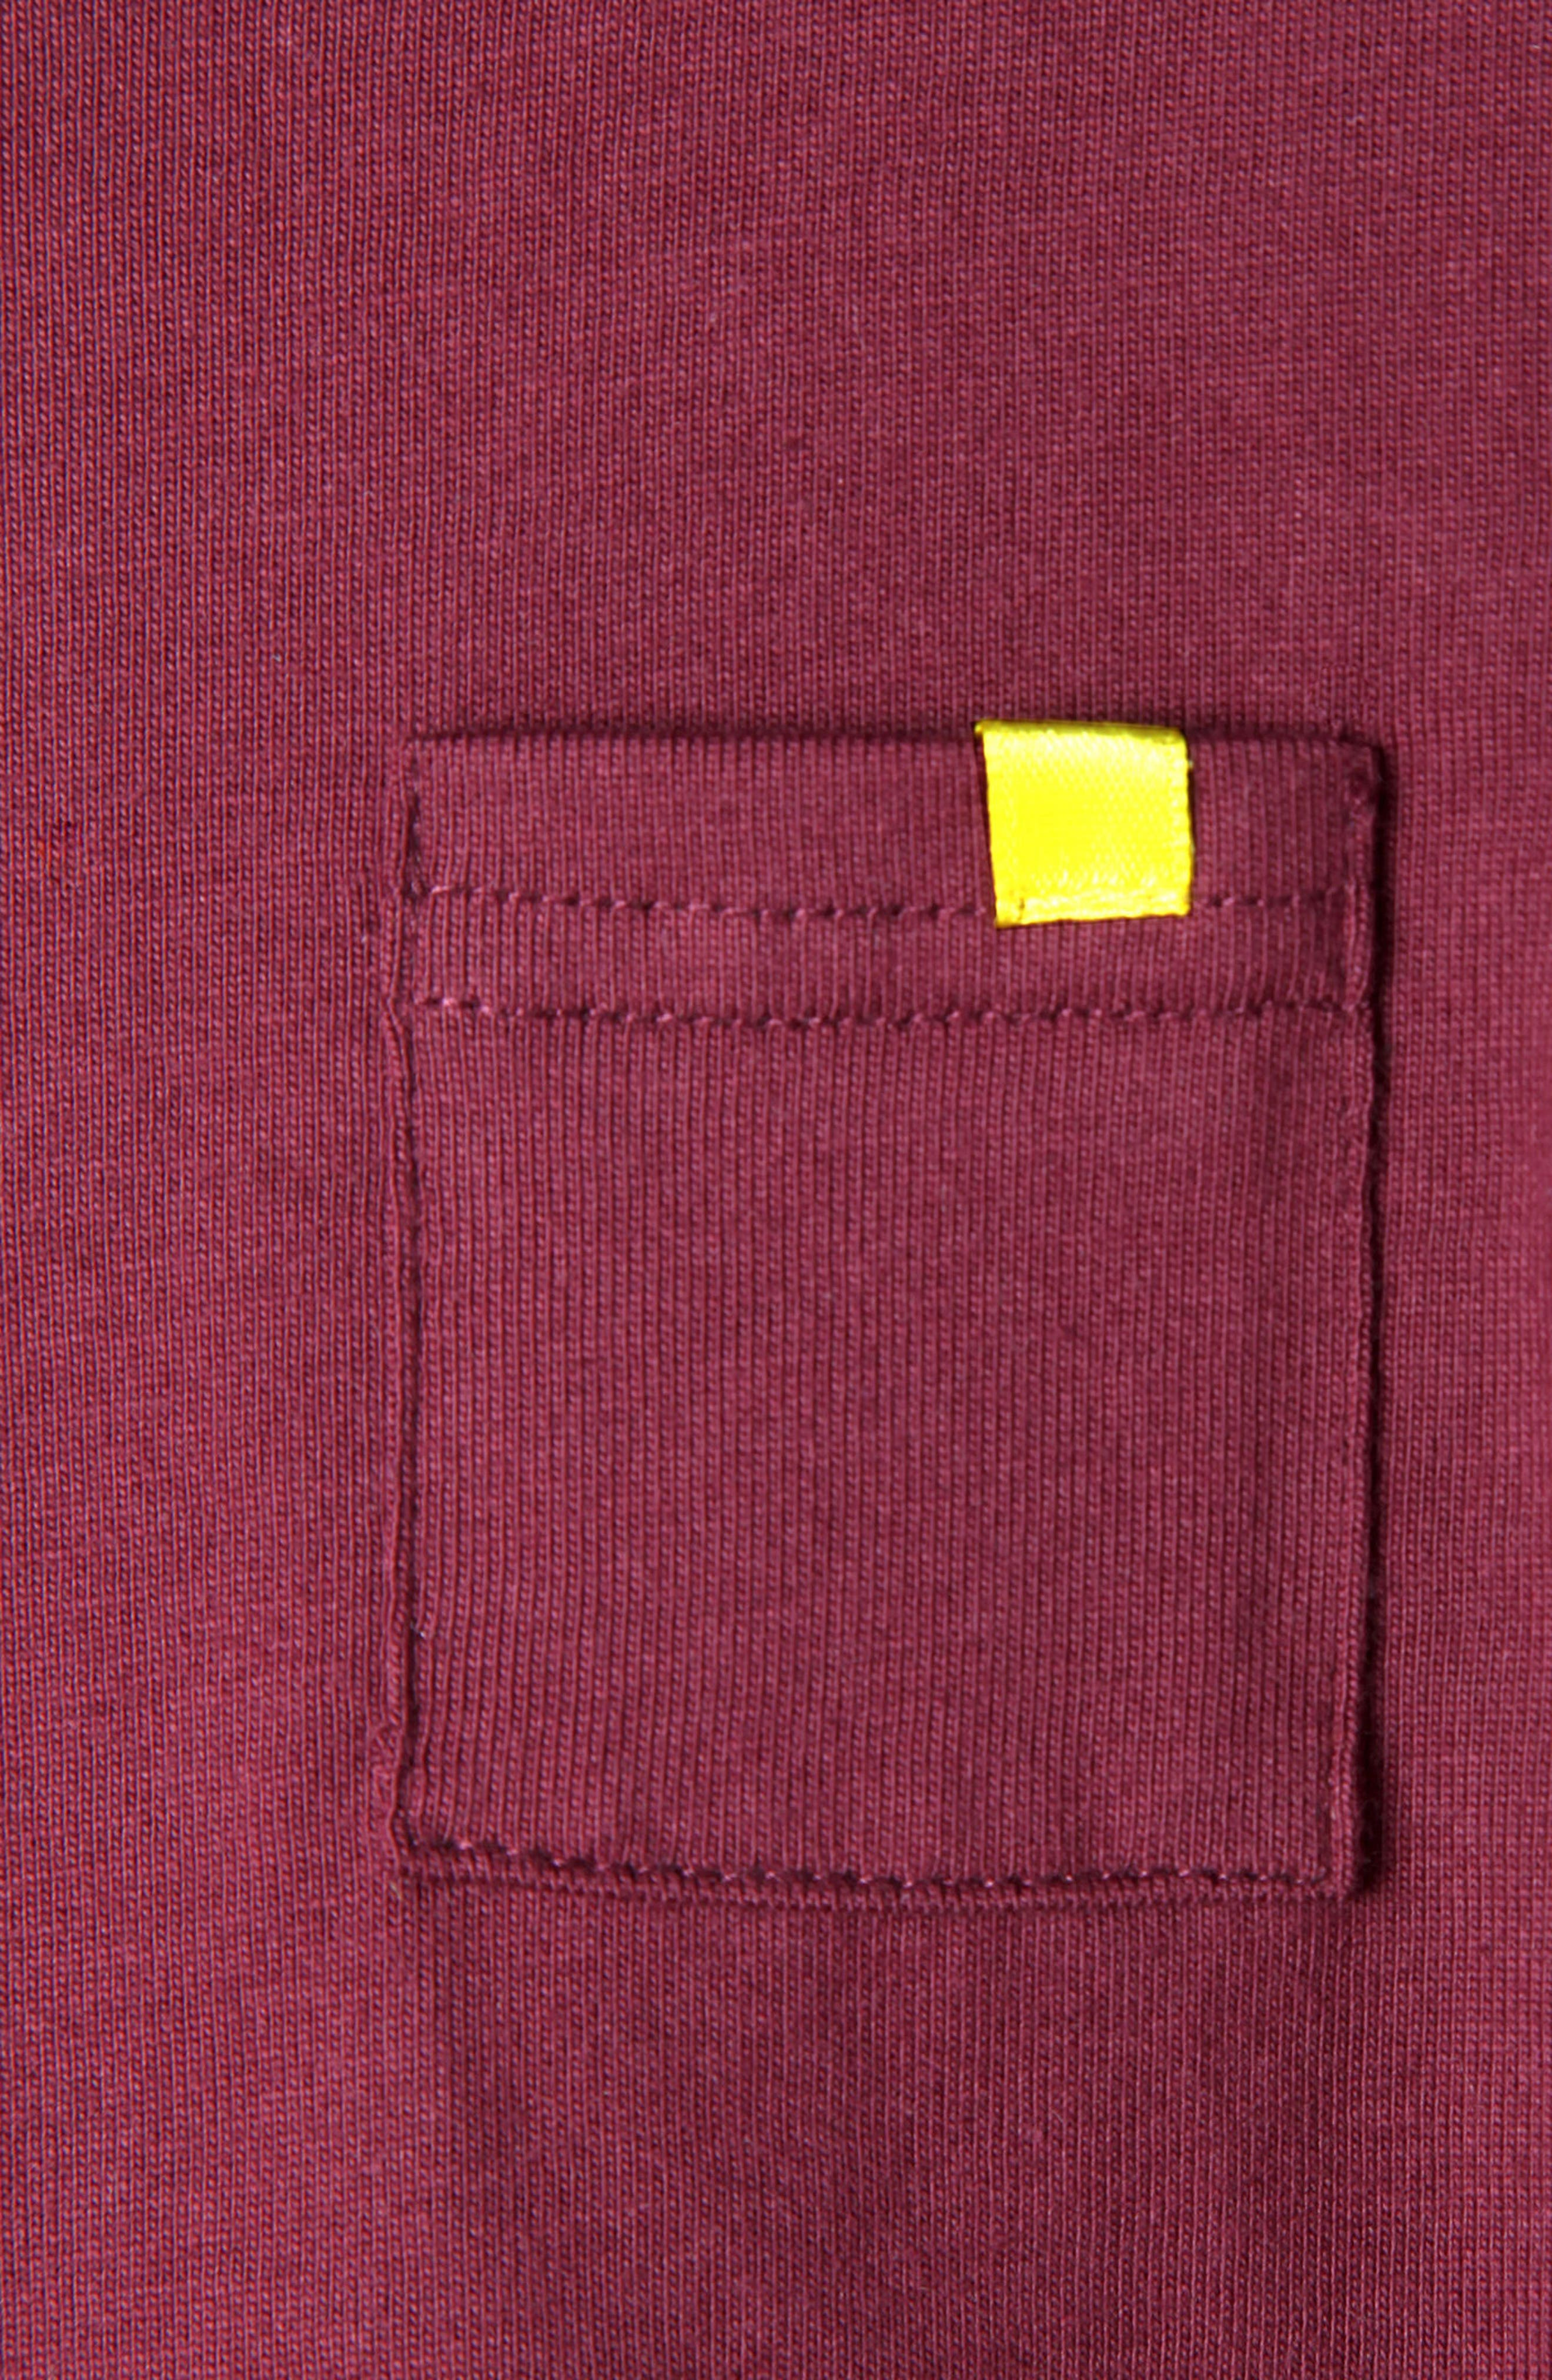 Alternate Image 2  - Art & Eden Organic Cotton T-Shirt (Baby Boys)